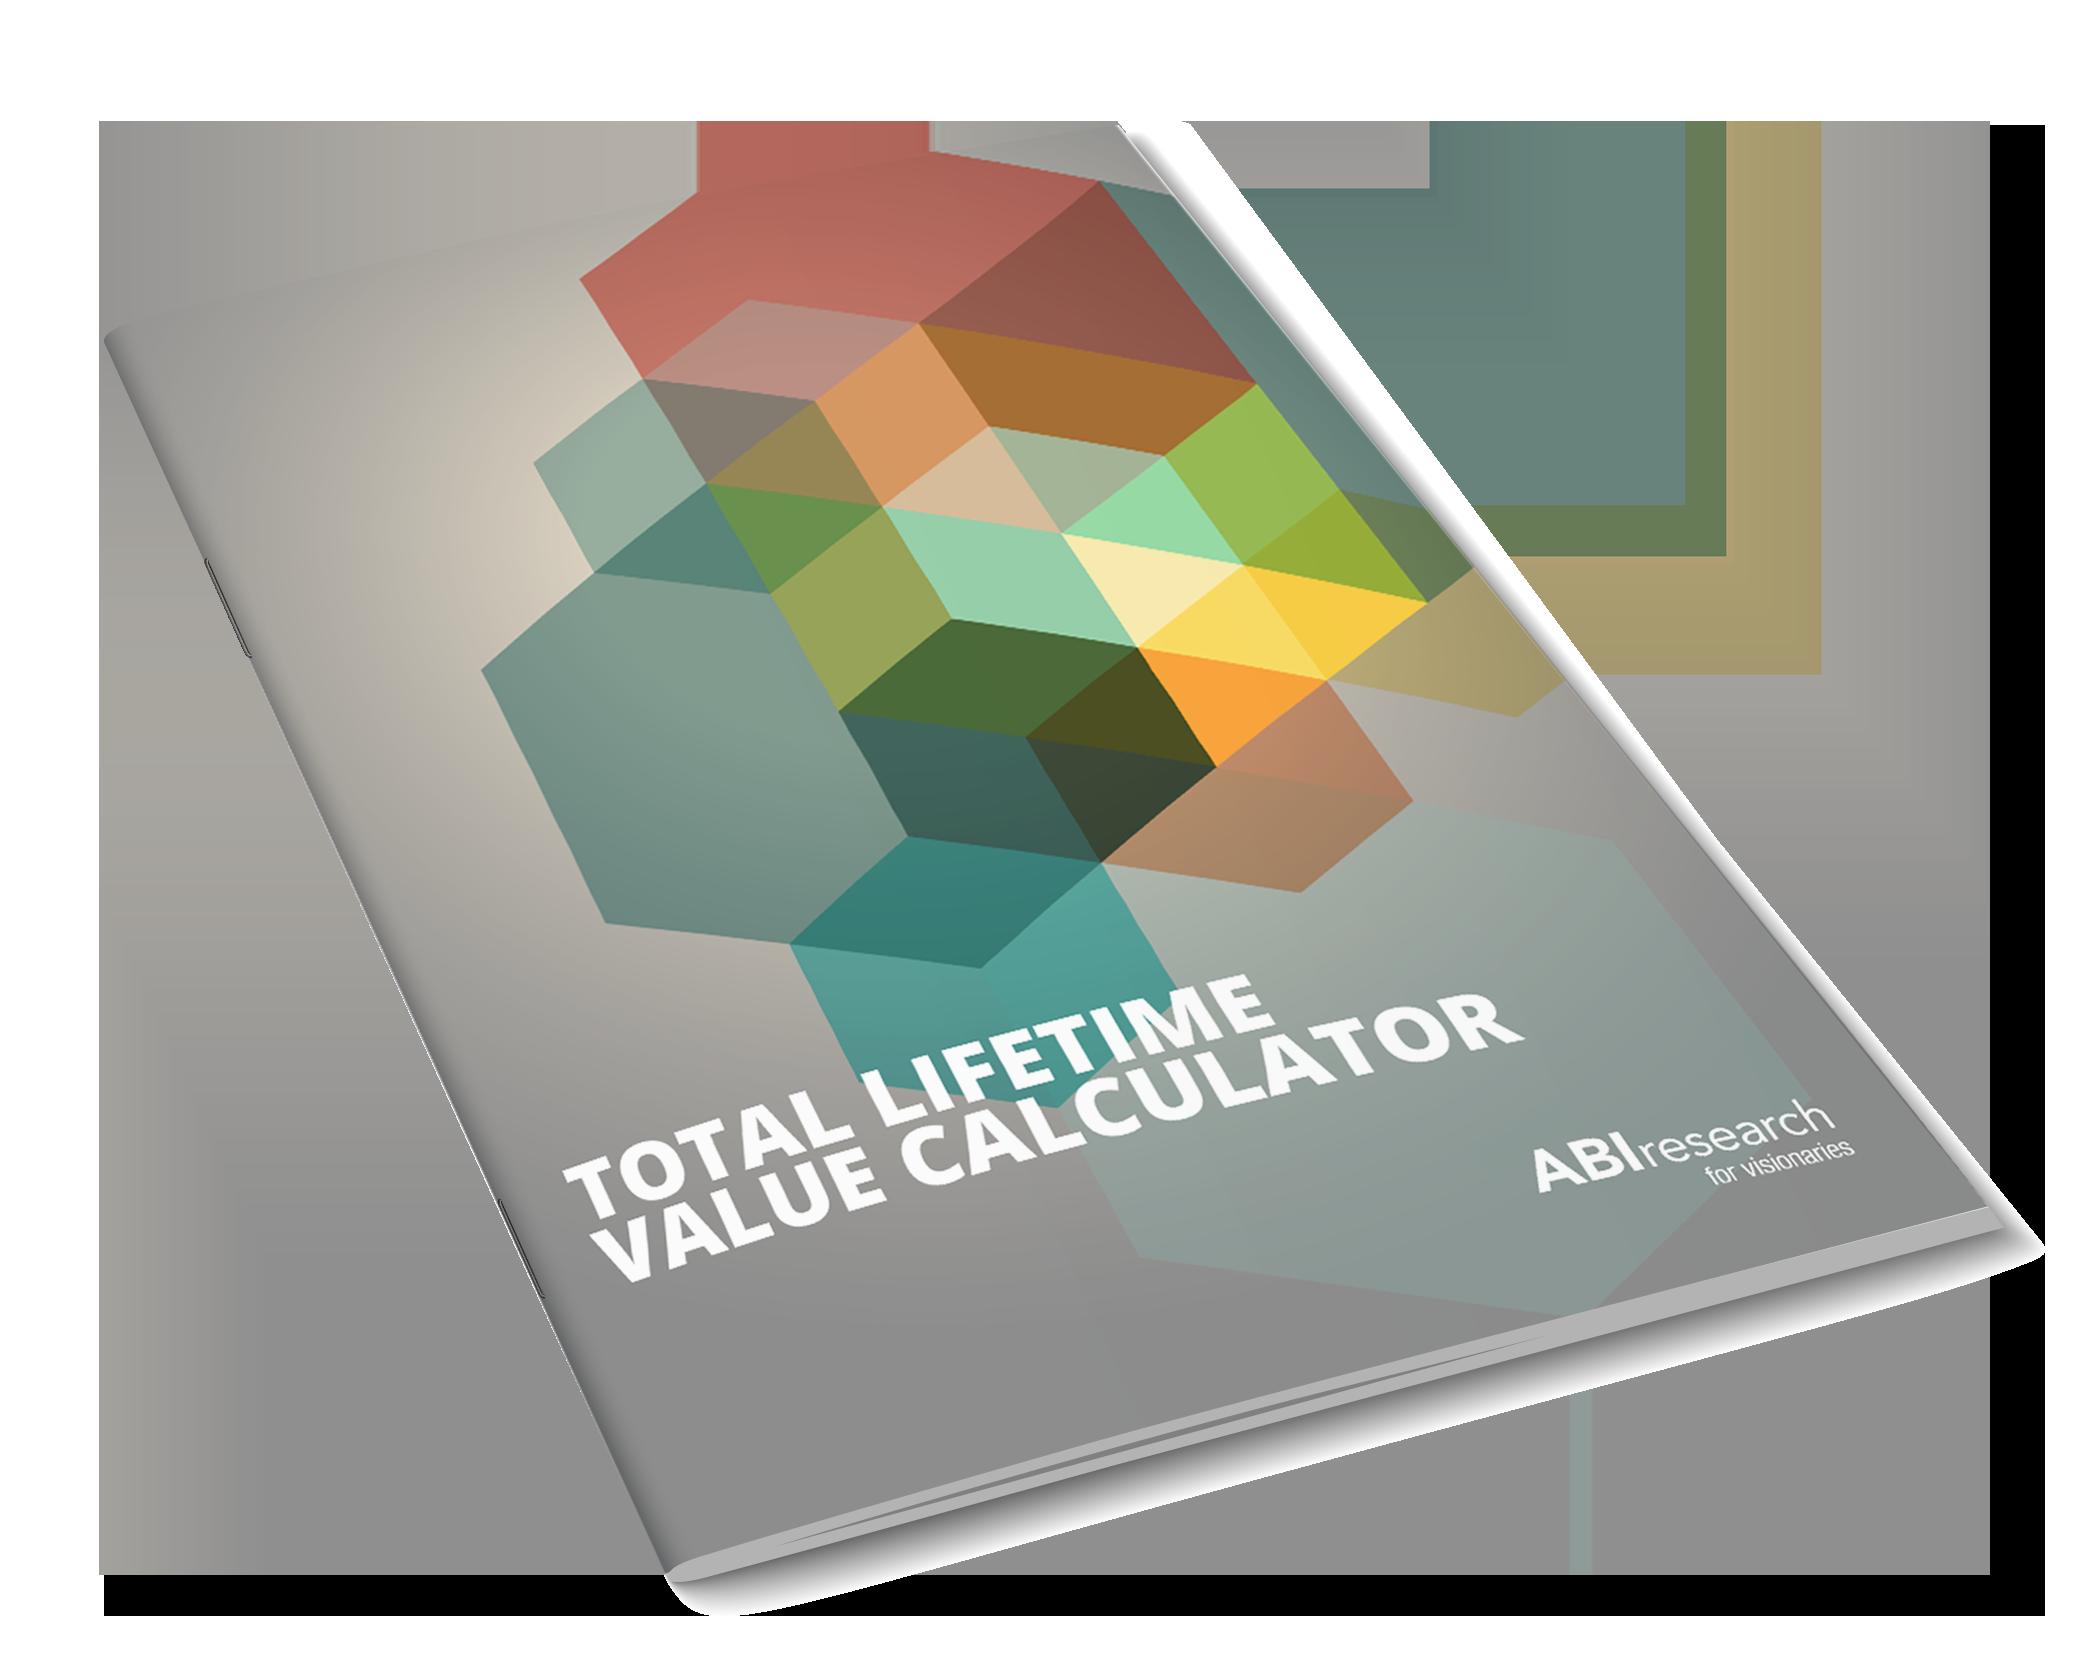 Industrial Blockchain Lifetime Value Calculator Image